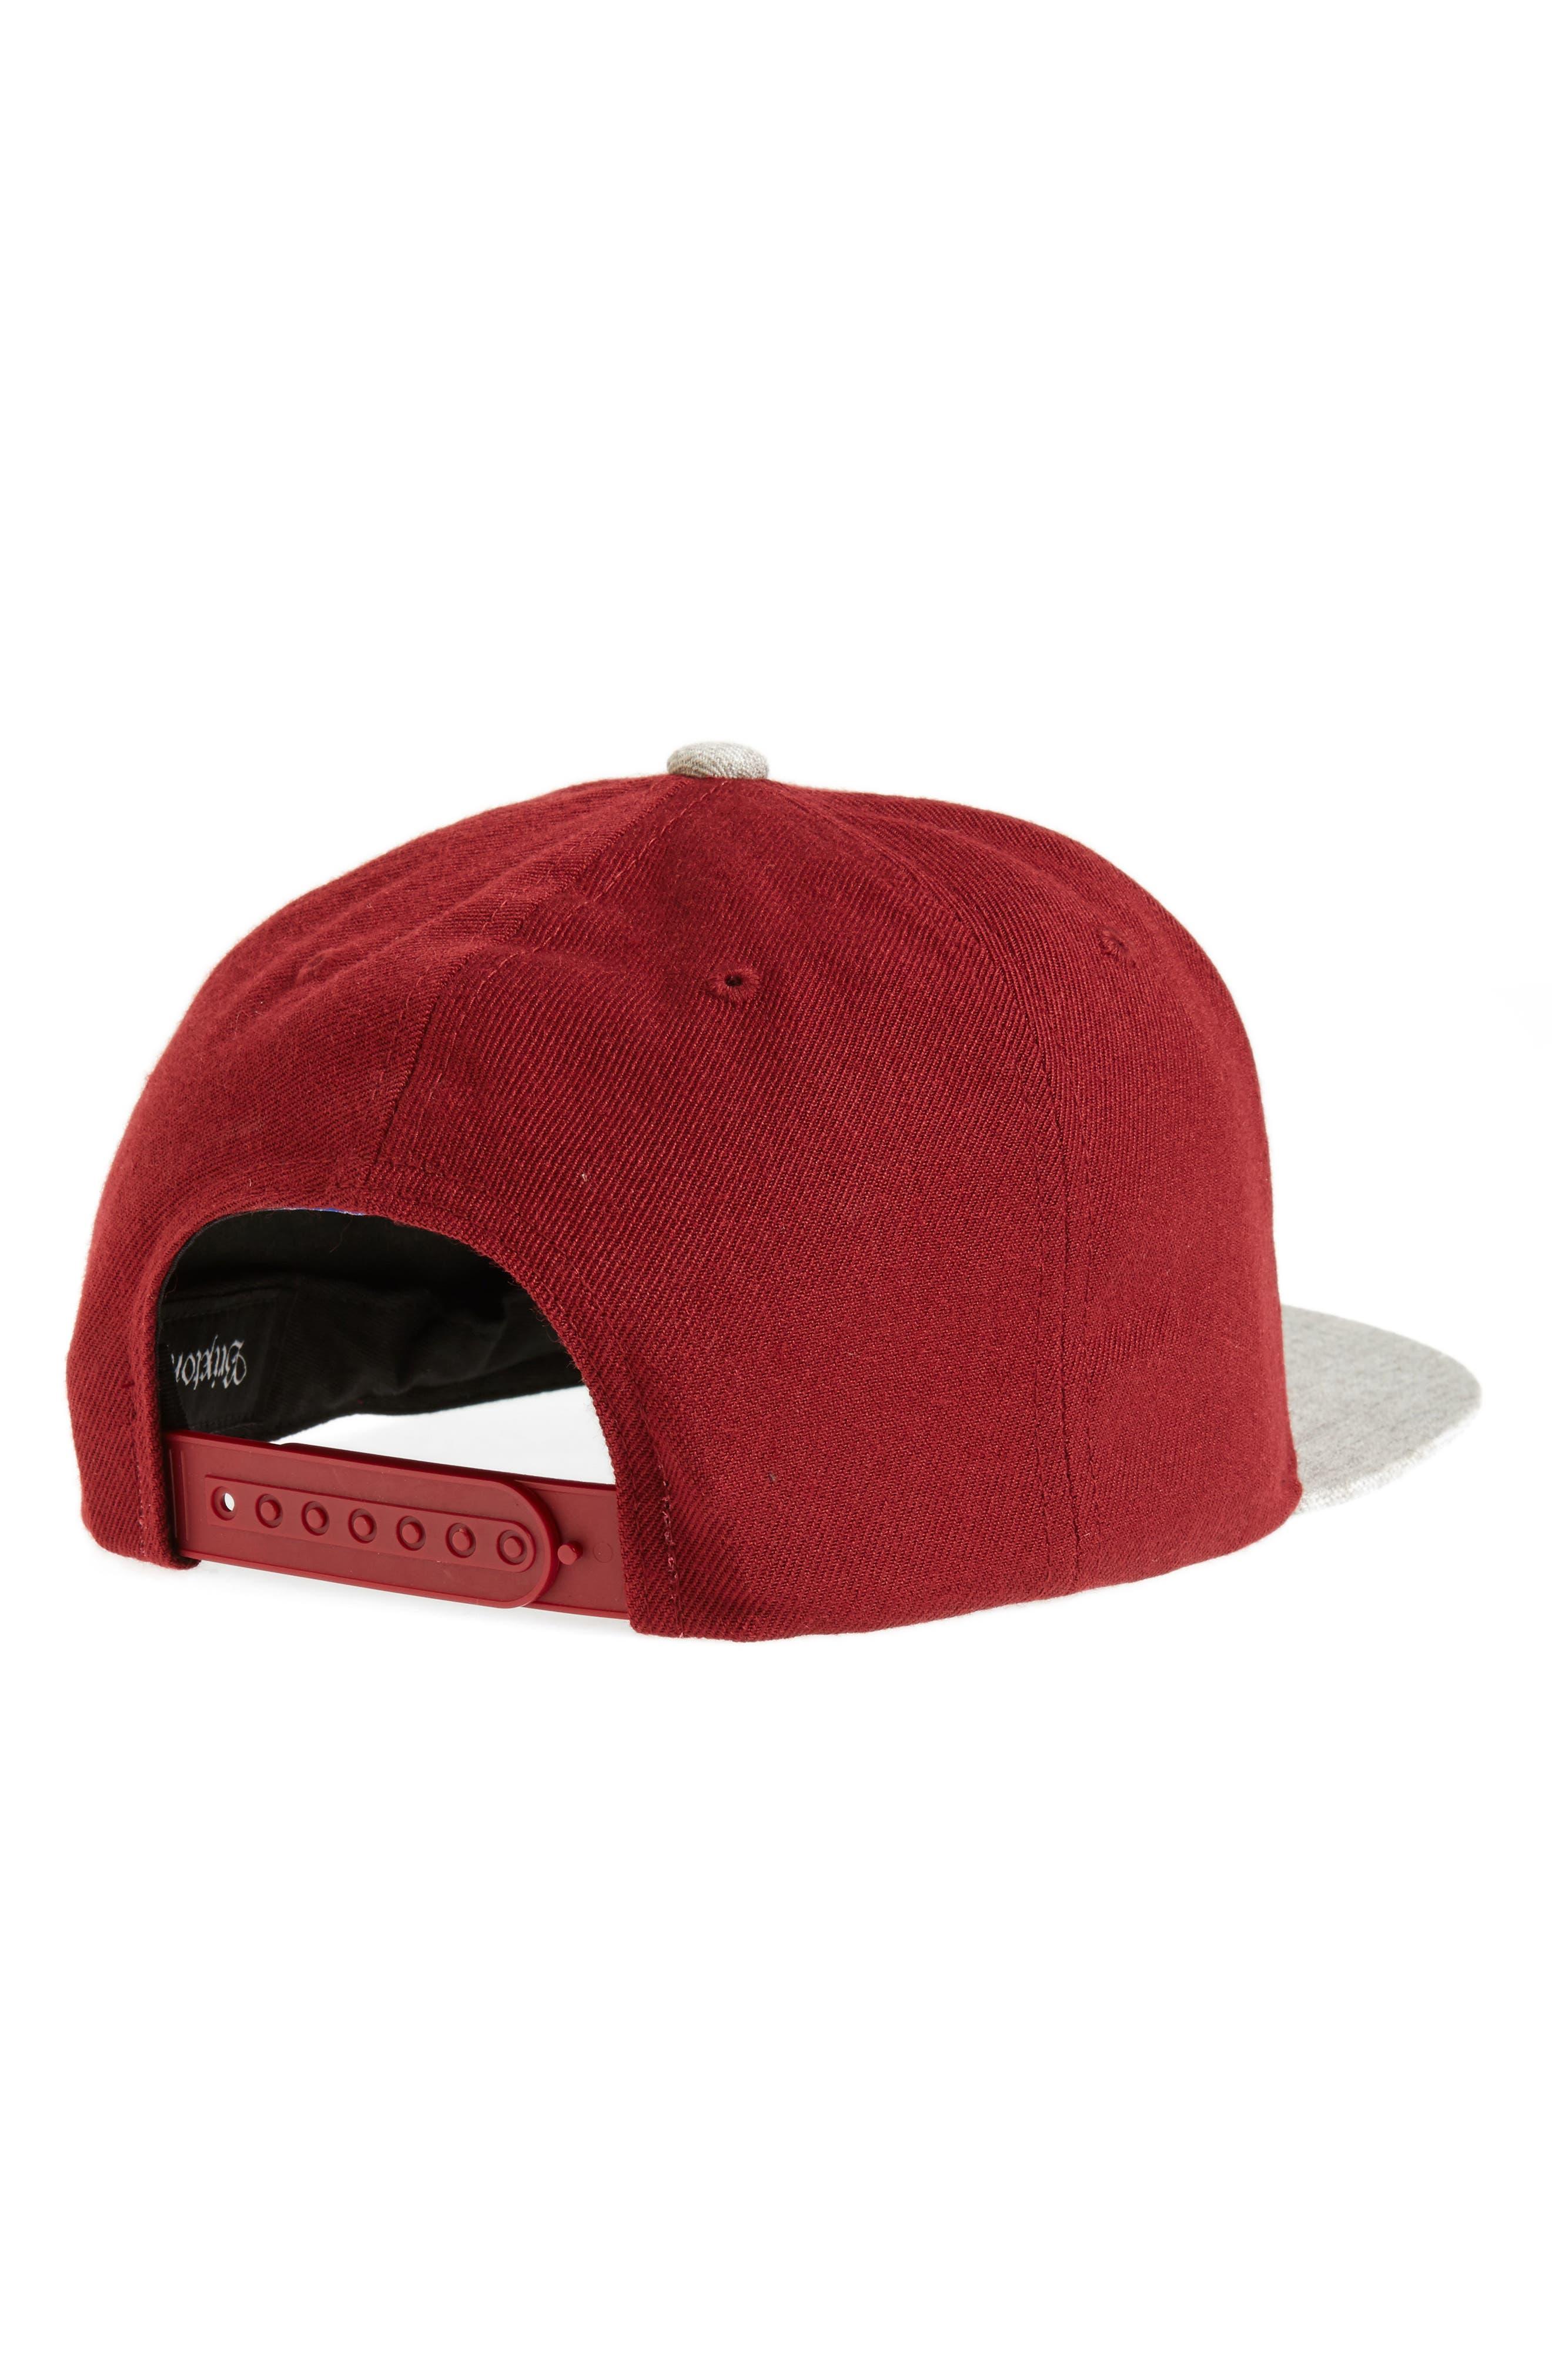 Wheeler Snapback Baseball Cap,                             Alternate thumbnail 2, color,                             Burgundy/ Heather Grey